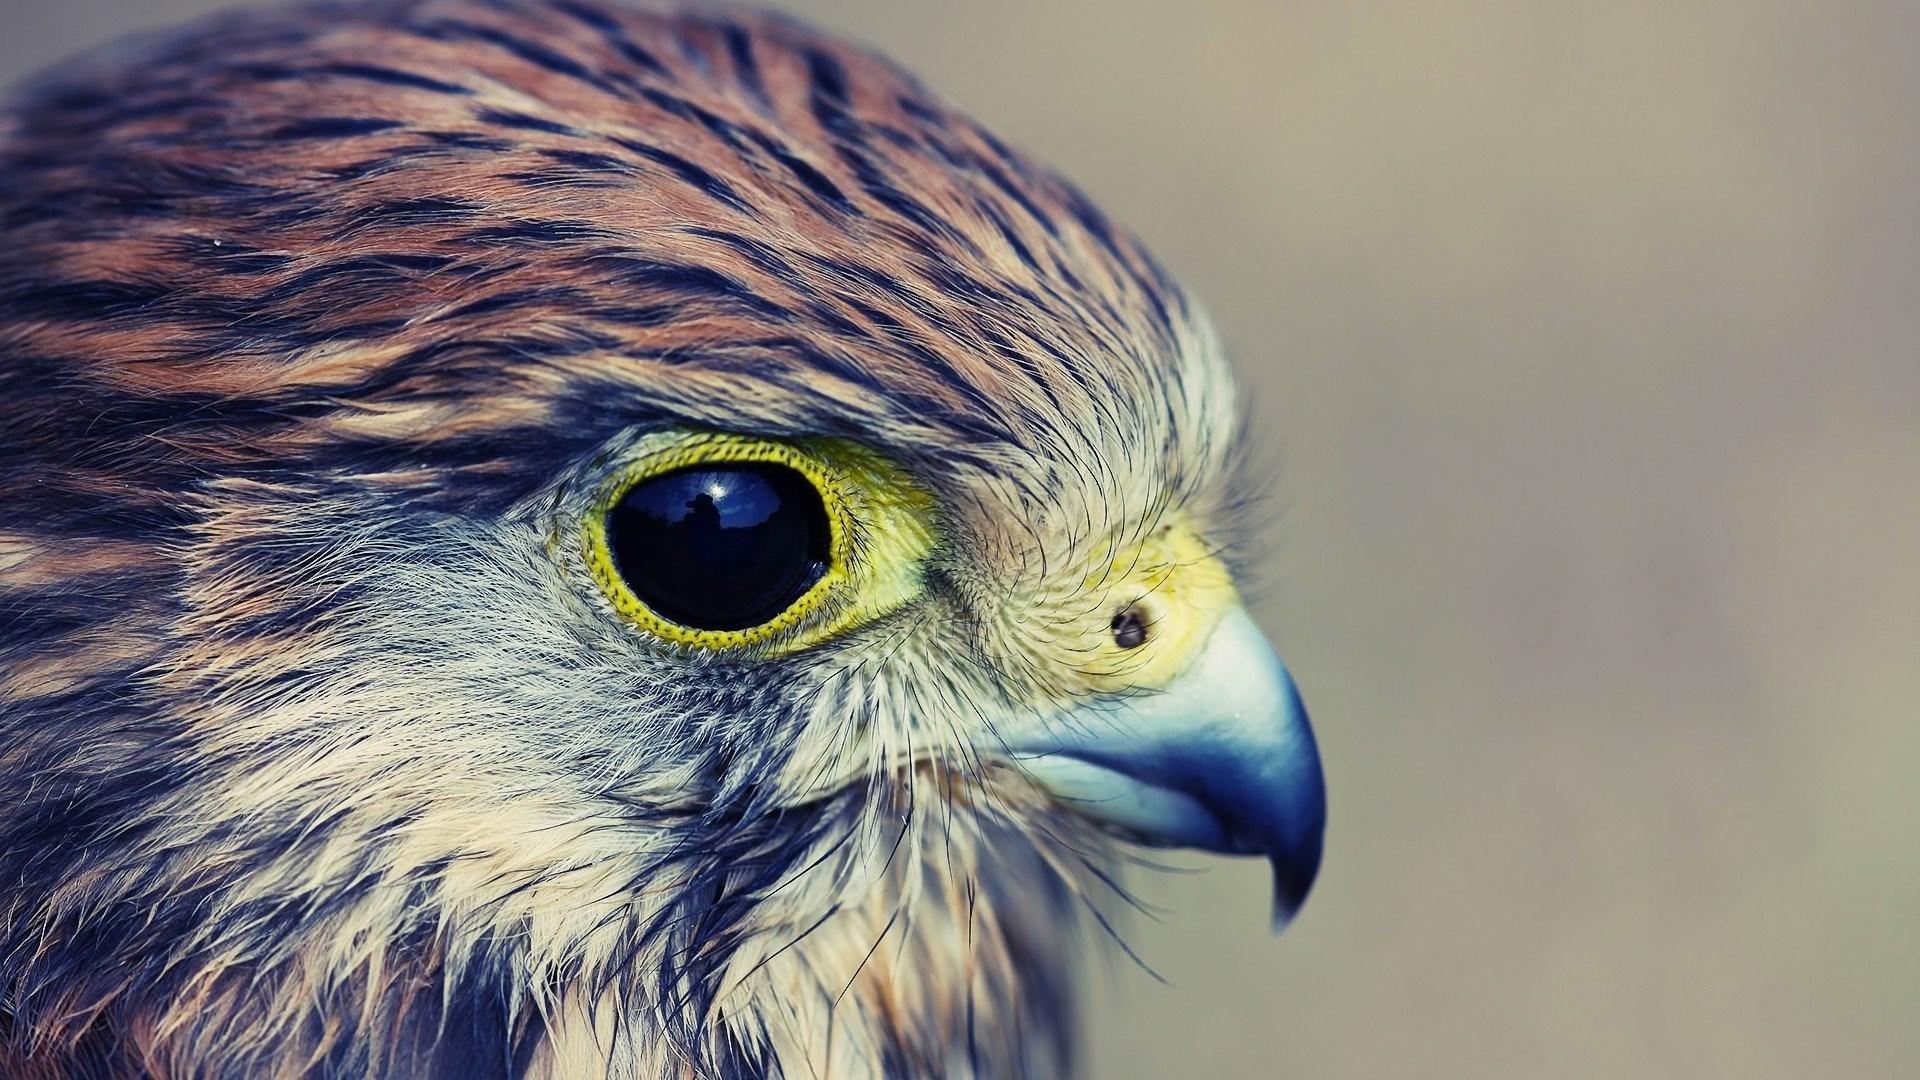 Bird of Prey Hawk Close-Up